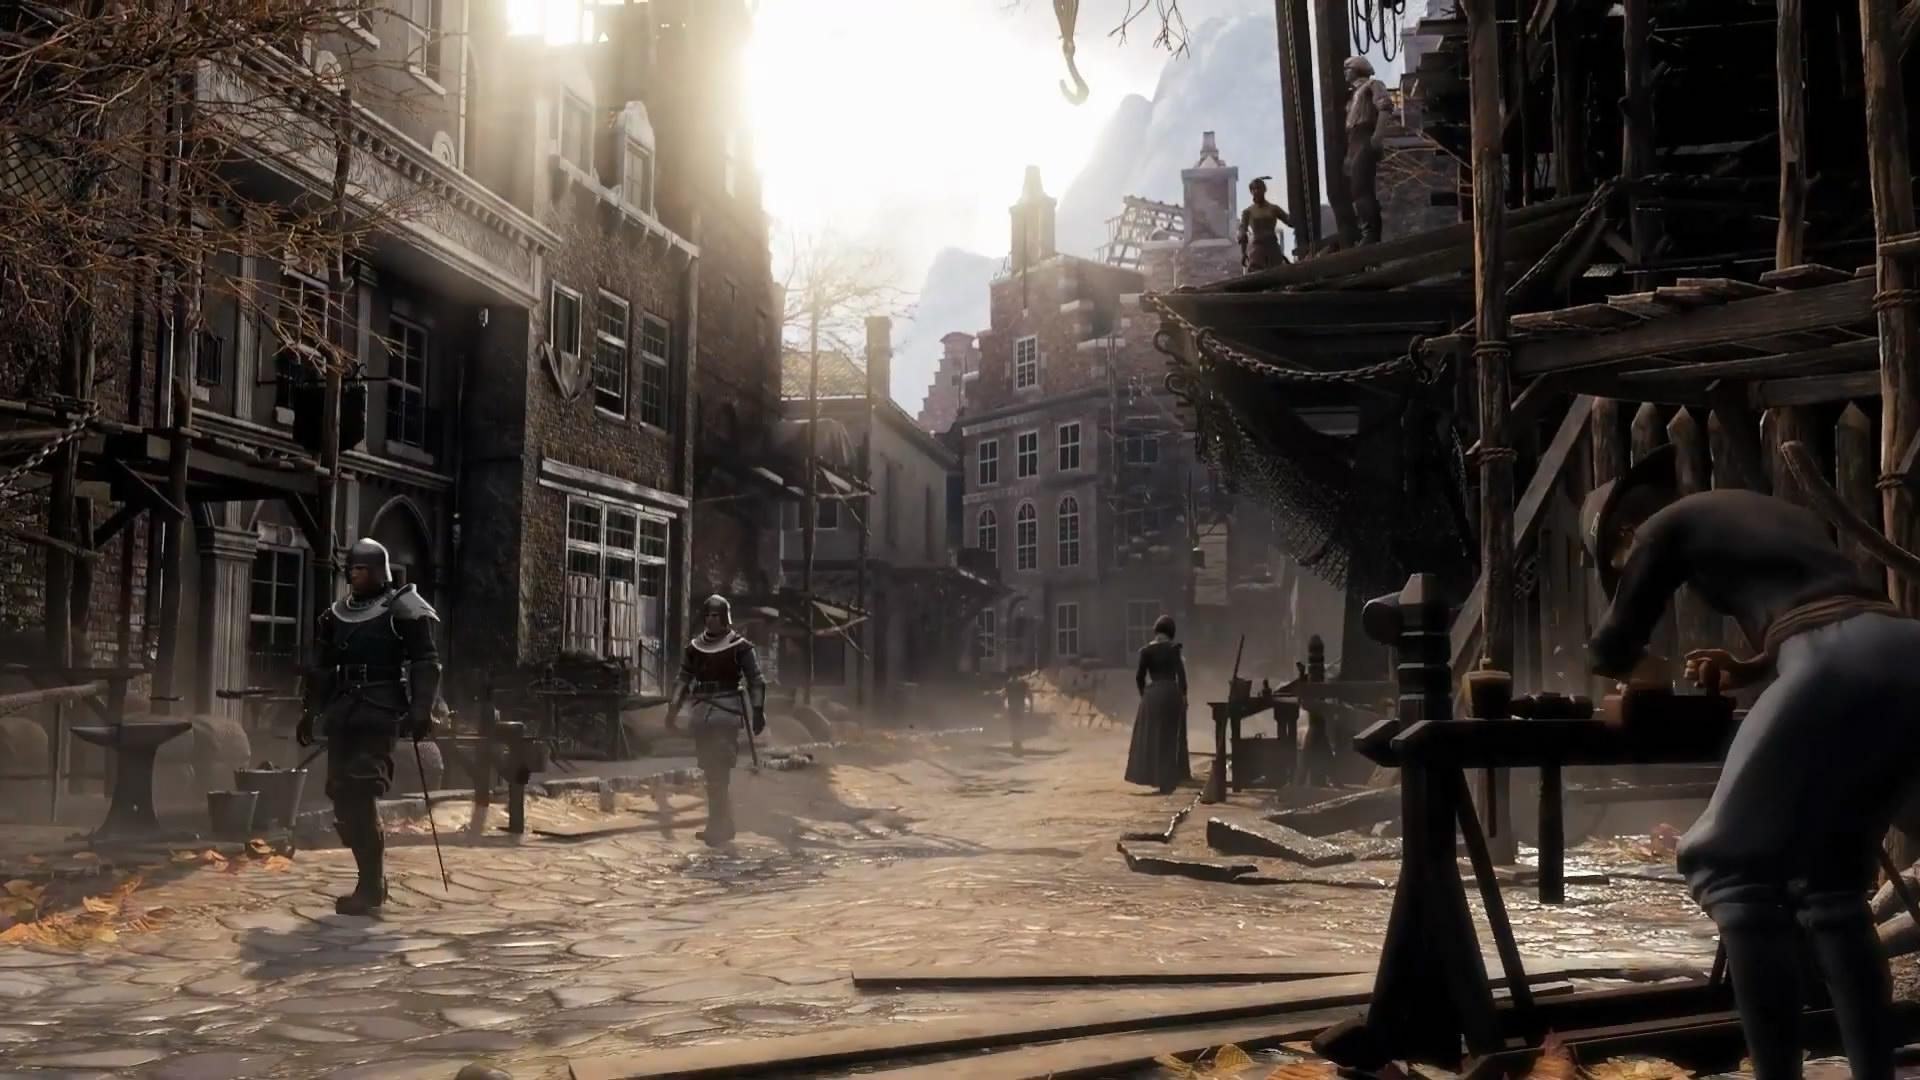 GC 2019:奇幻ARPG《贪婪之秋》新演示 探索神秘世界